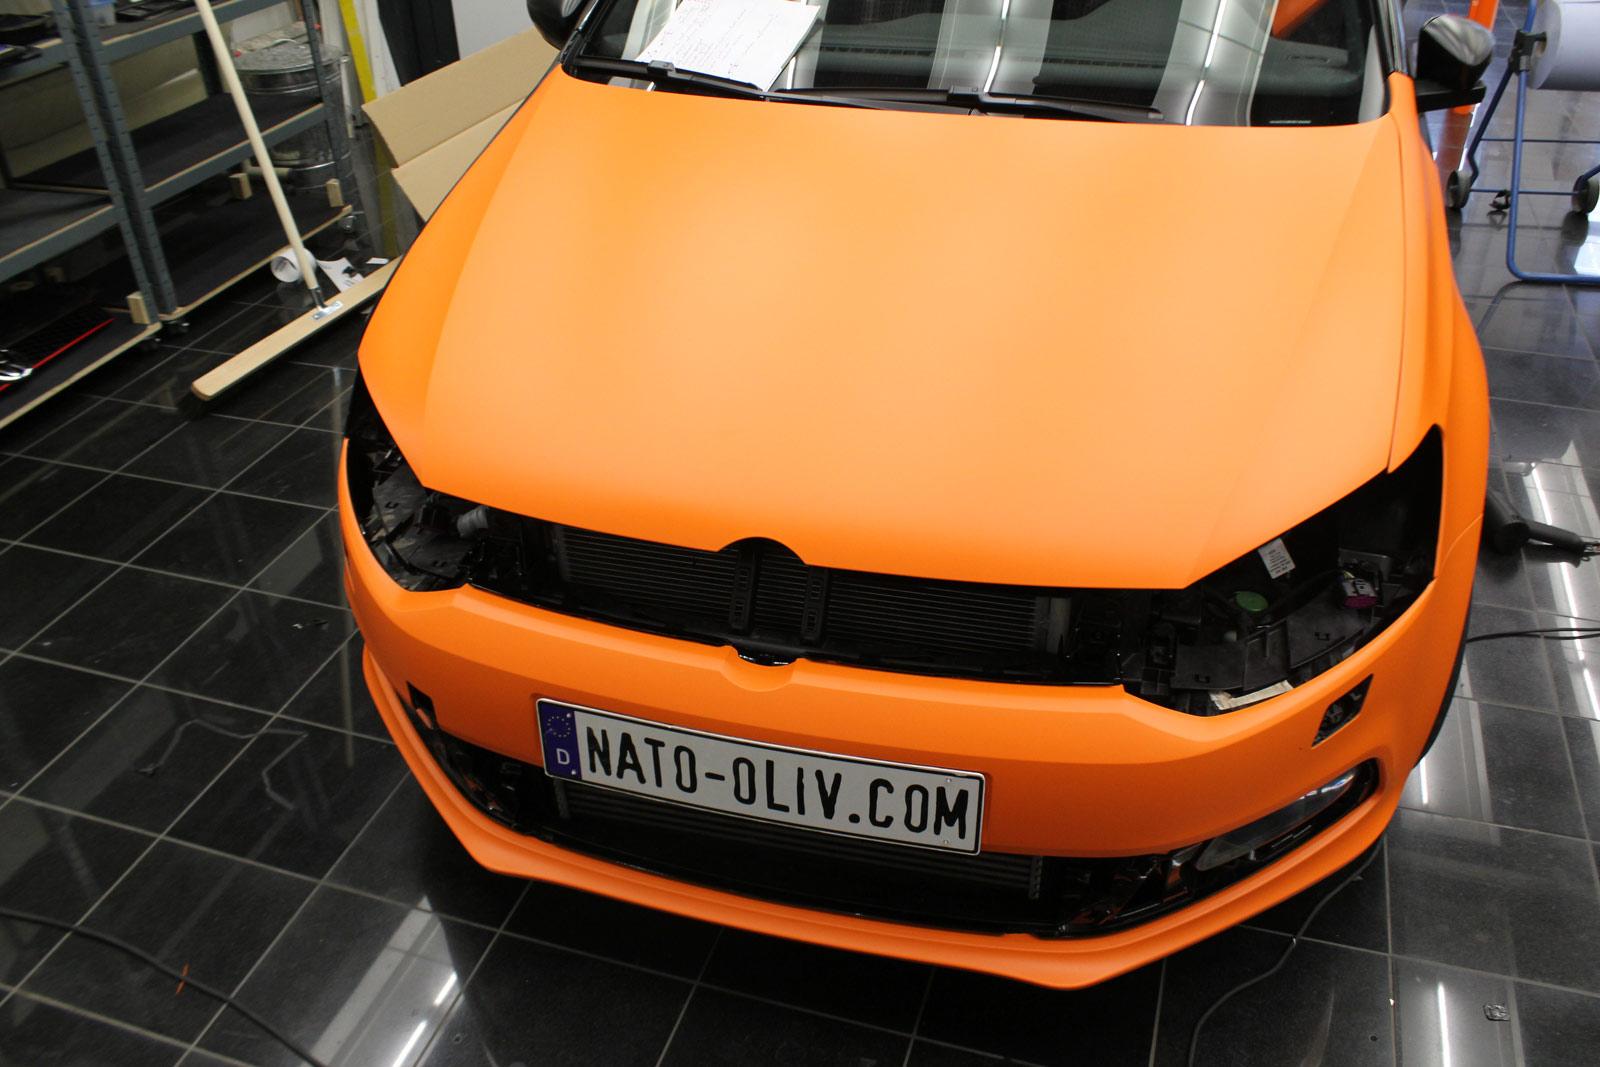 VW_Polo_GTI_Folierung_Orange_Matt_11